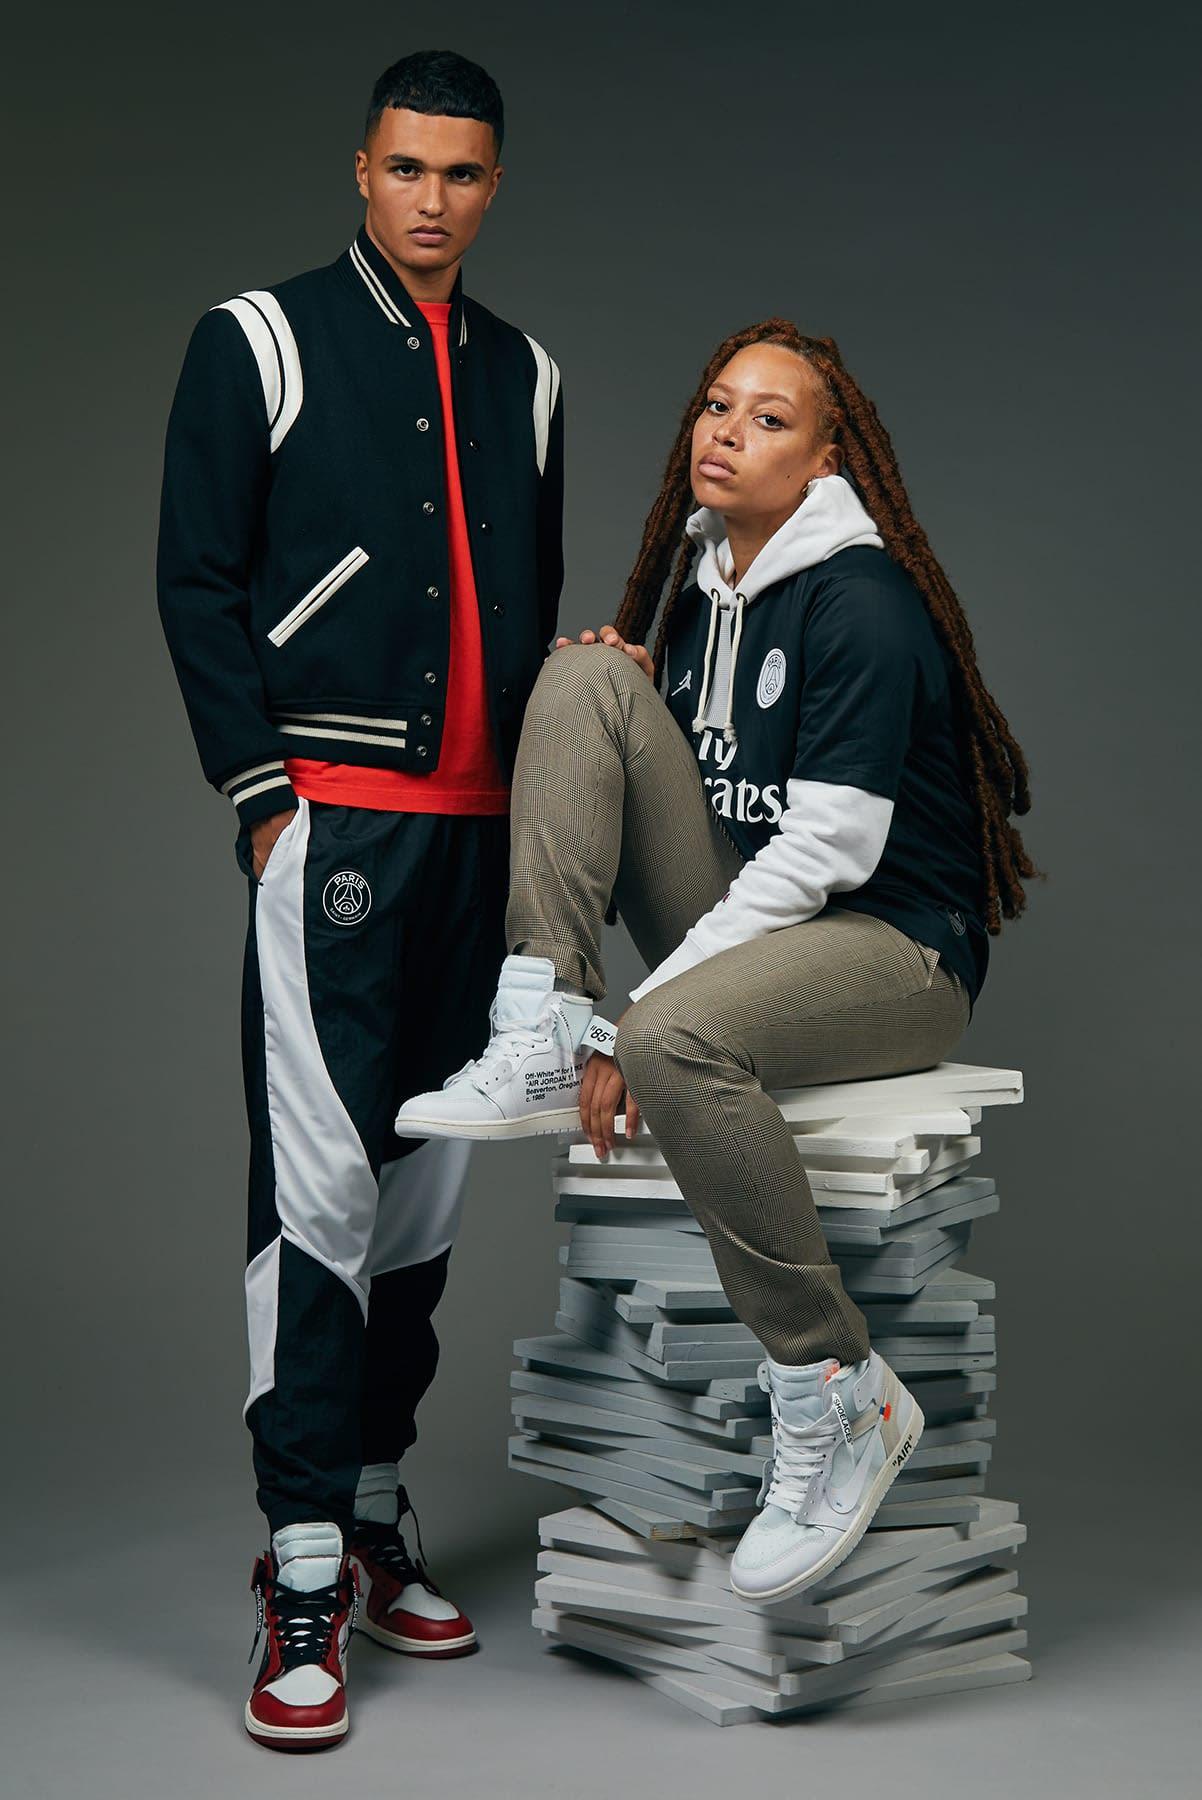 najwyższa jakość atrakcyjna cena kody promocyjne END. Features | Nike Air Jordan x Paris Saint-Germain ...